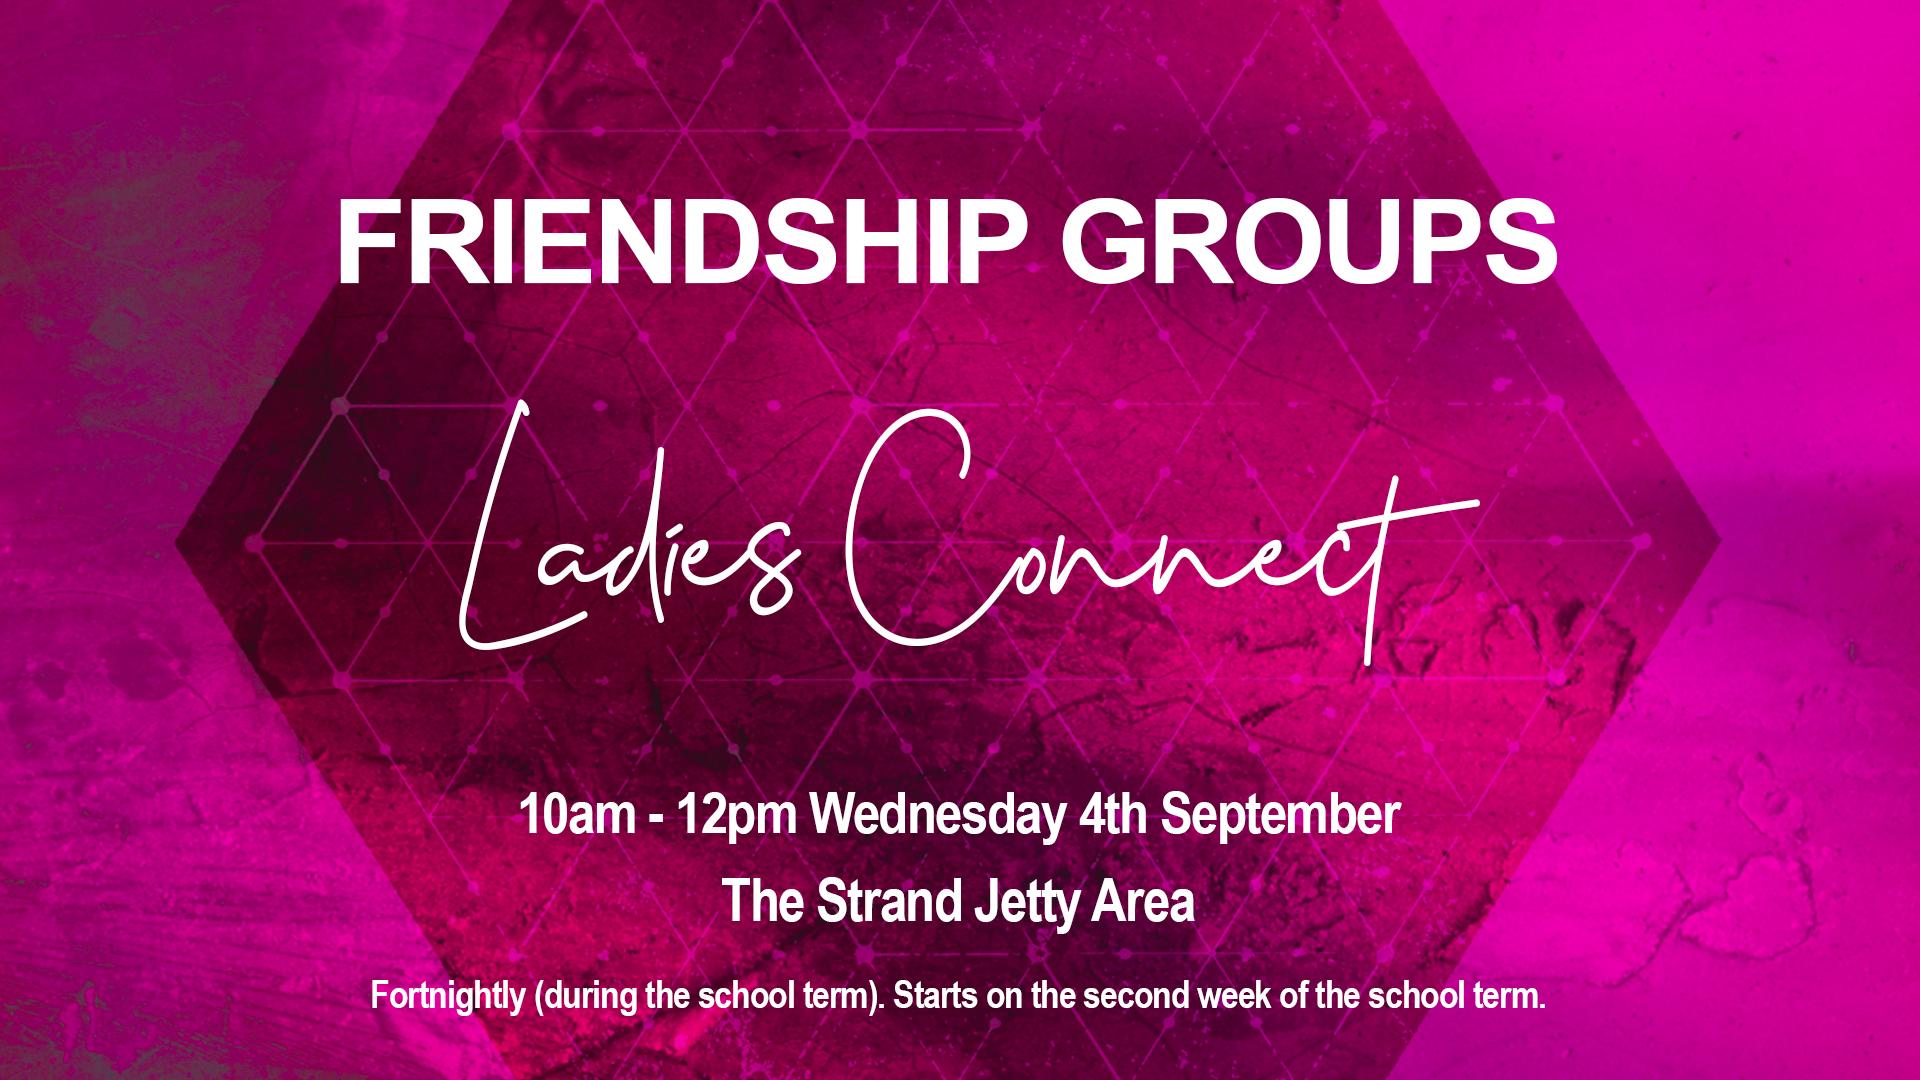 Ladies-connect-foyer-4th-sept.jpg